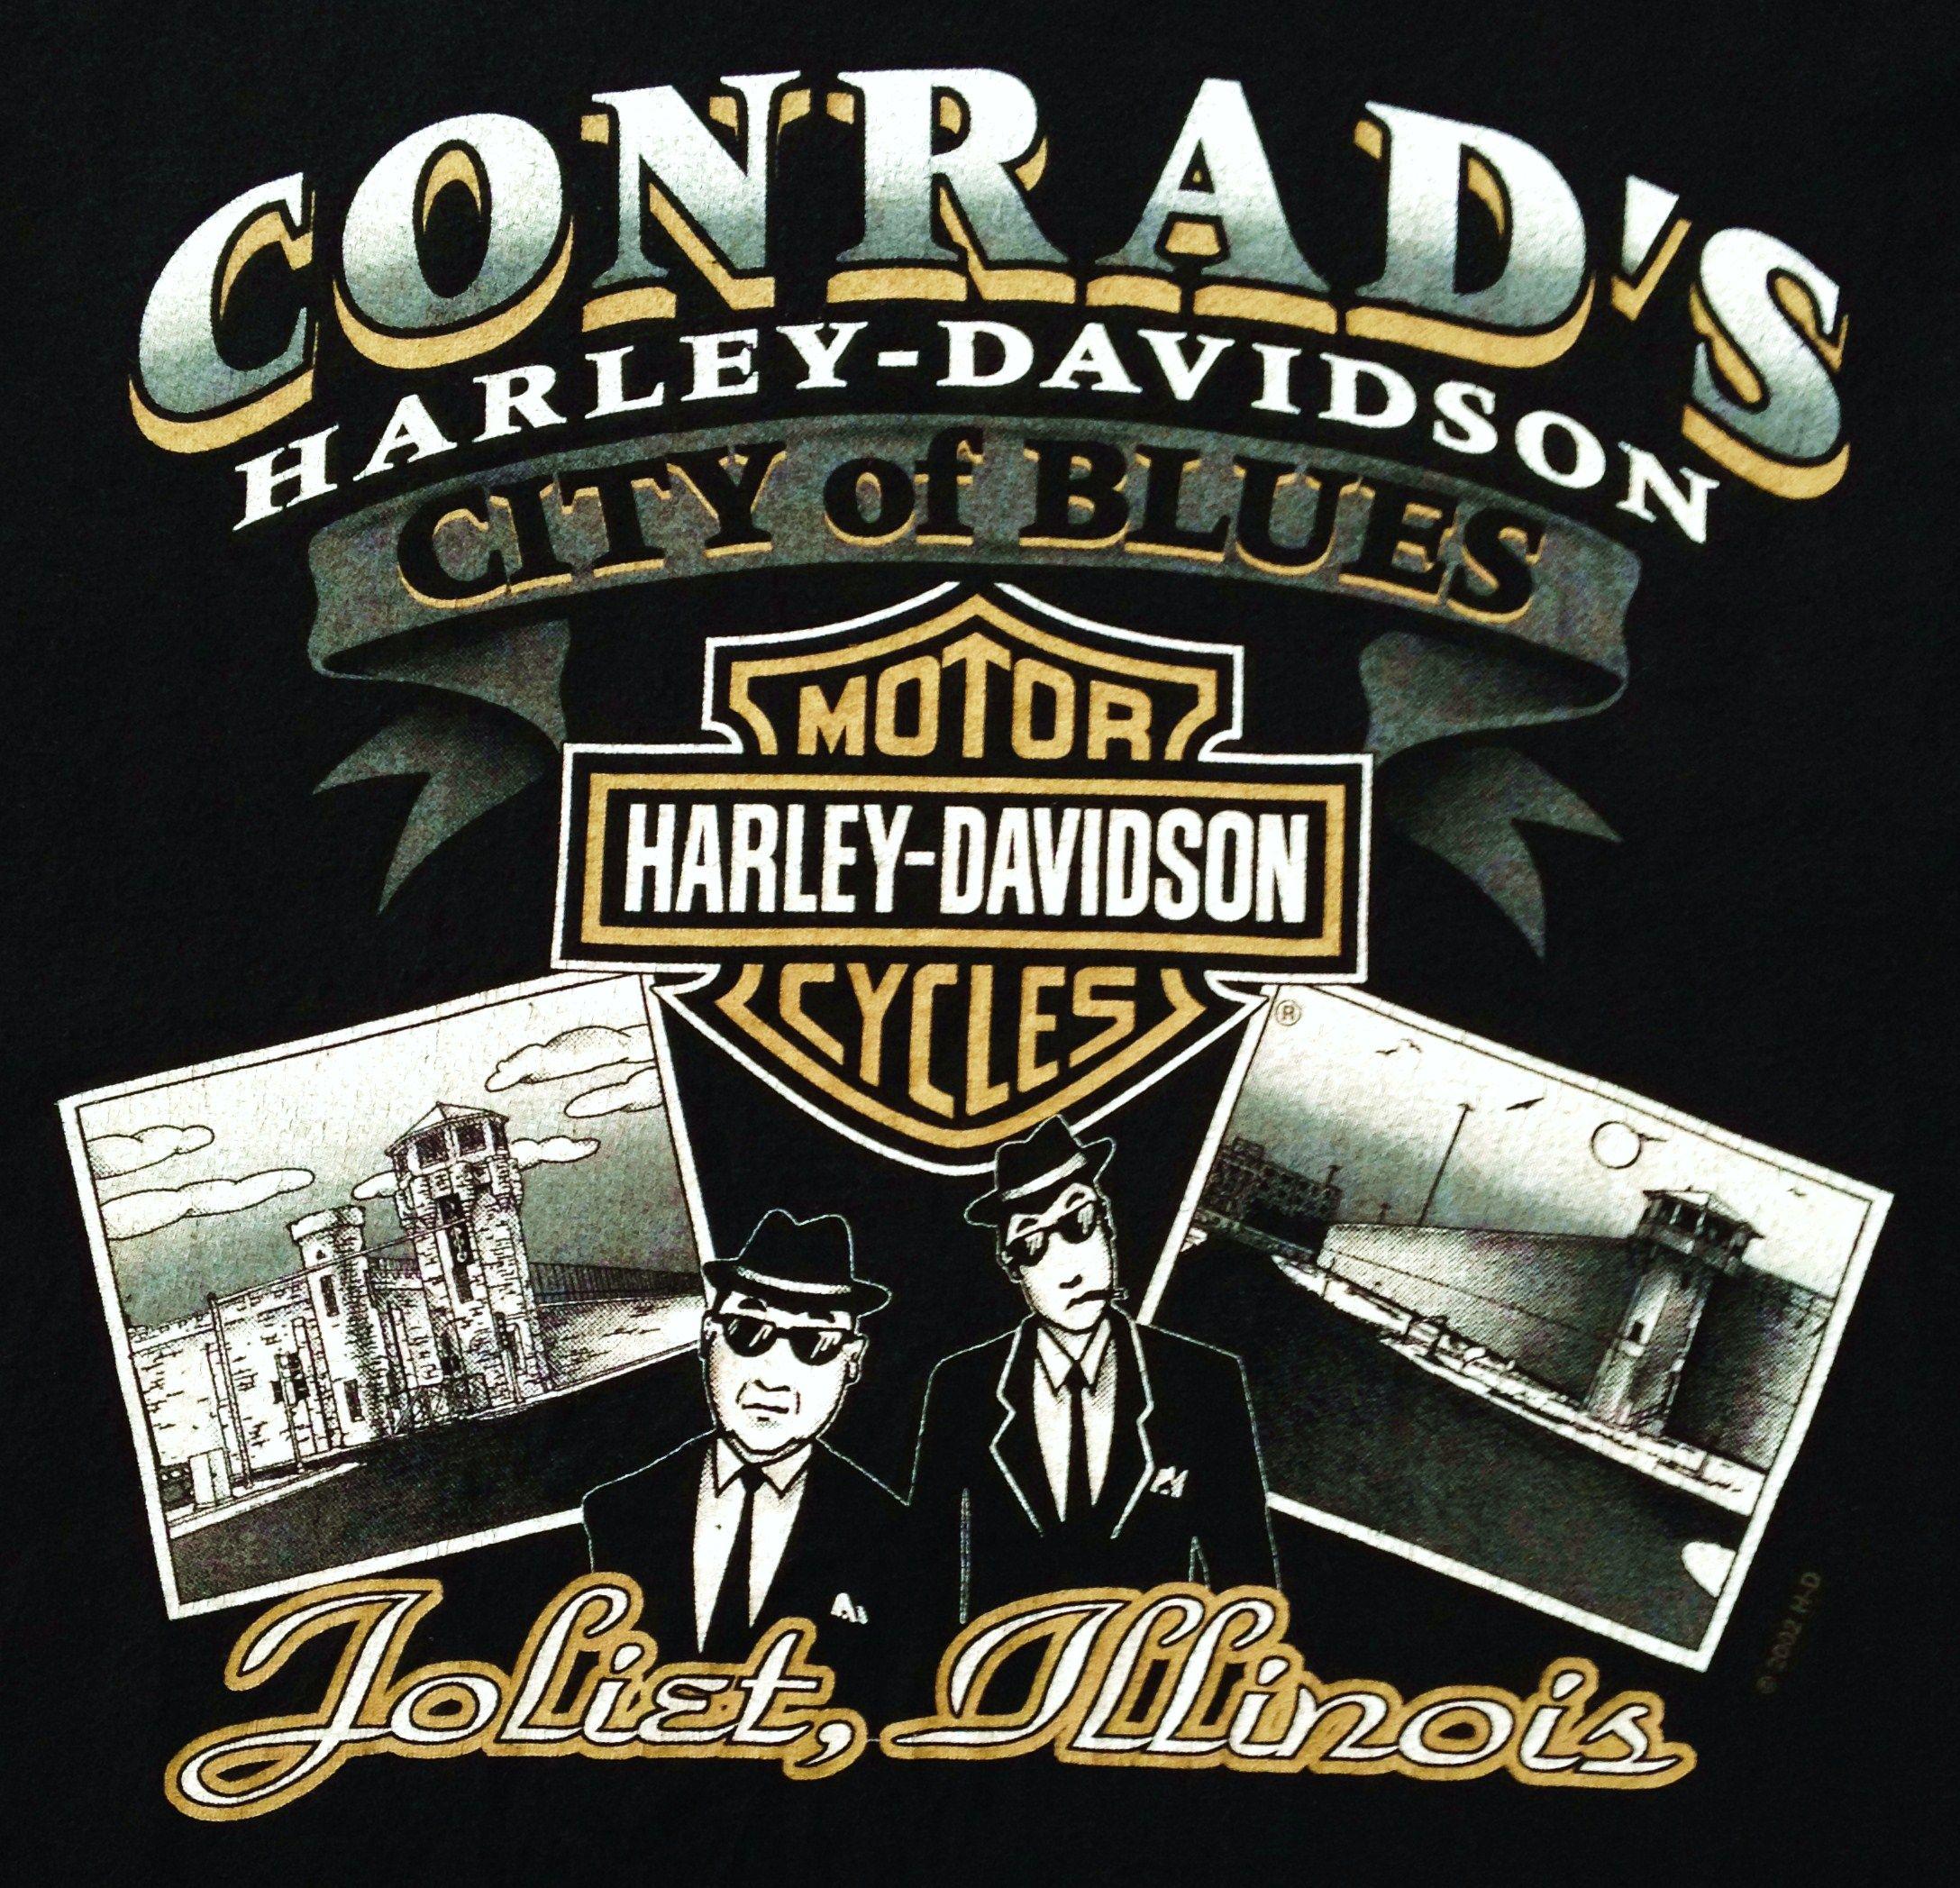 Conrads Harley Davidson >> Conrad's H-D Joliet, IL back | Harley davidson dealership, Harley davidson posters, Harley ...